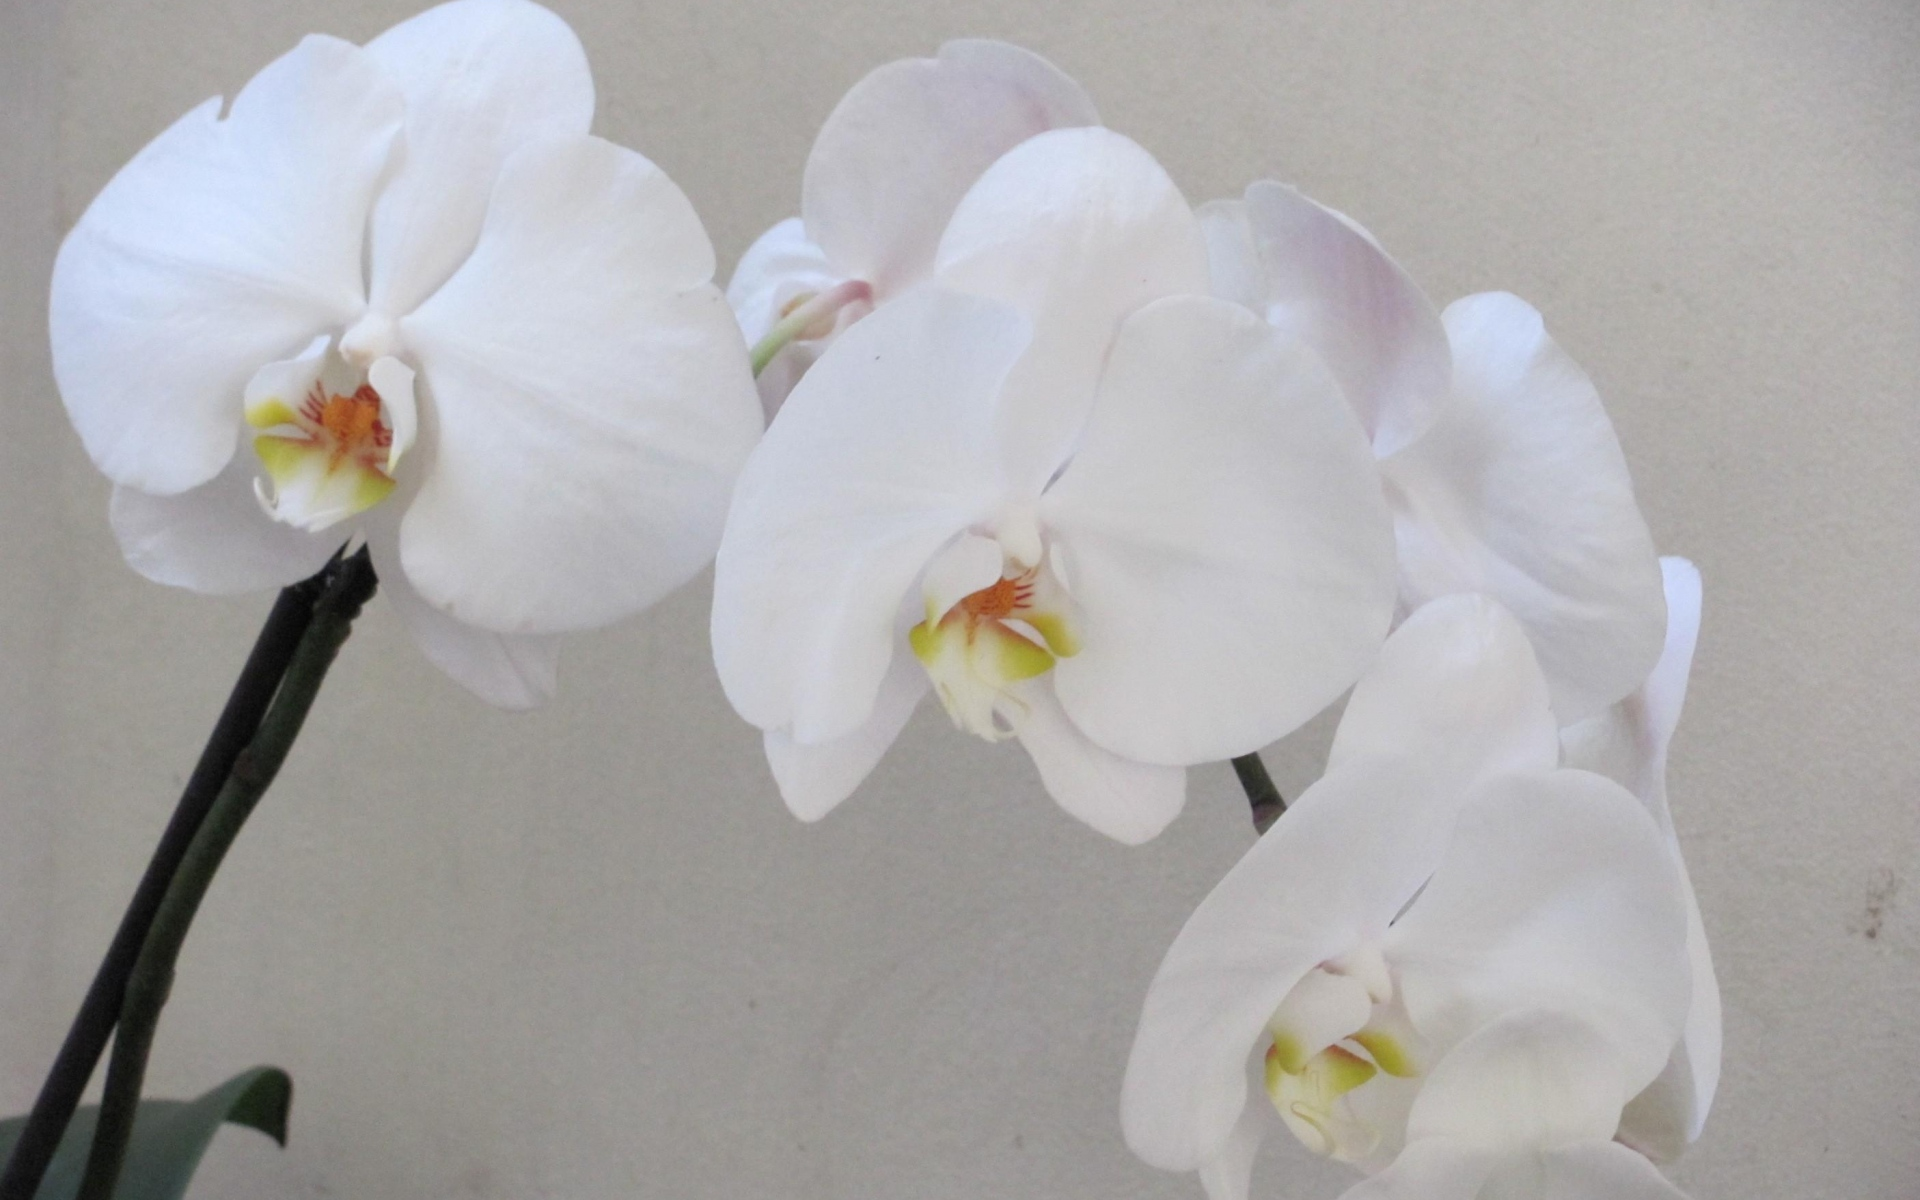 Картинки Орхидеи, ветка, цветок, белый фото и обои на рабочий стол